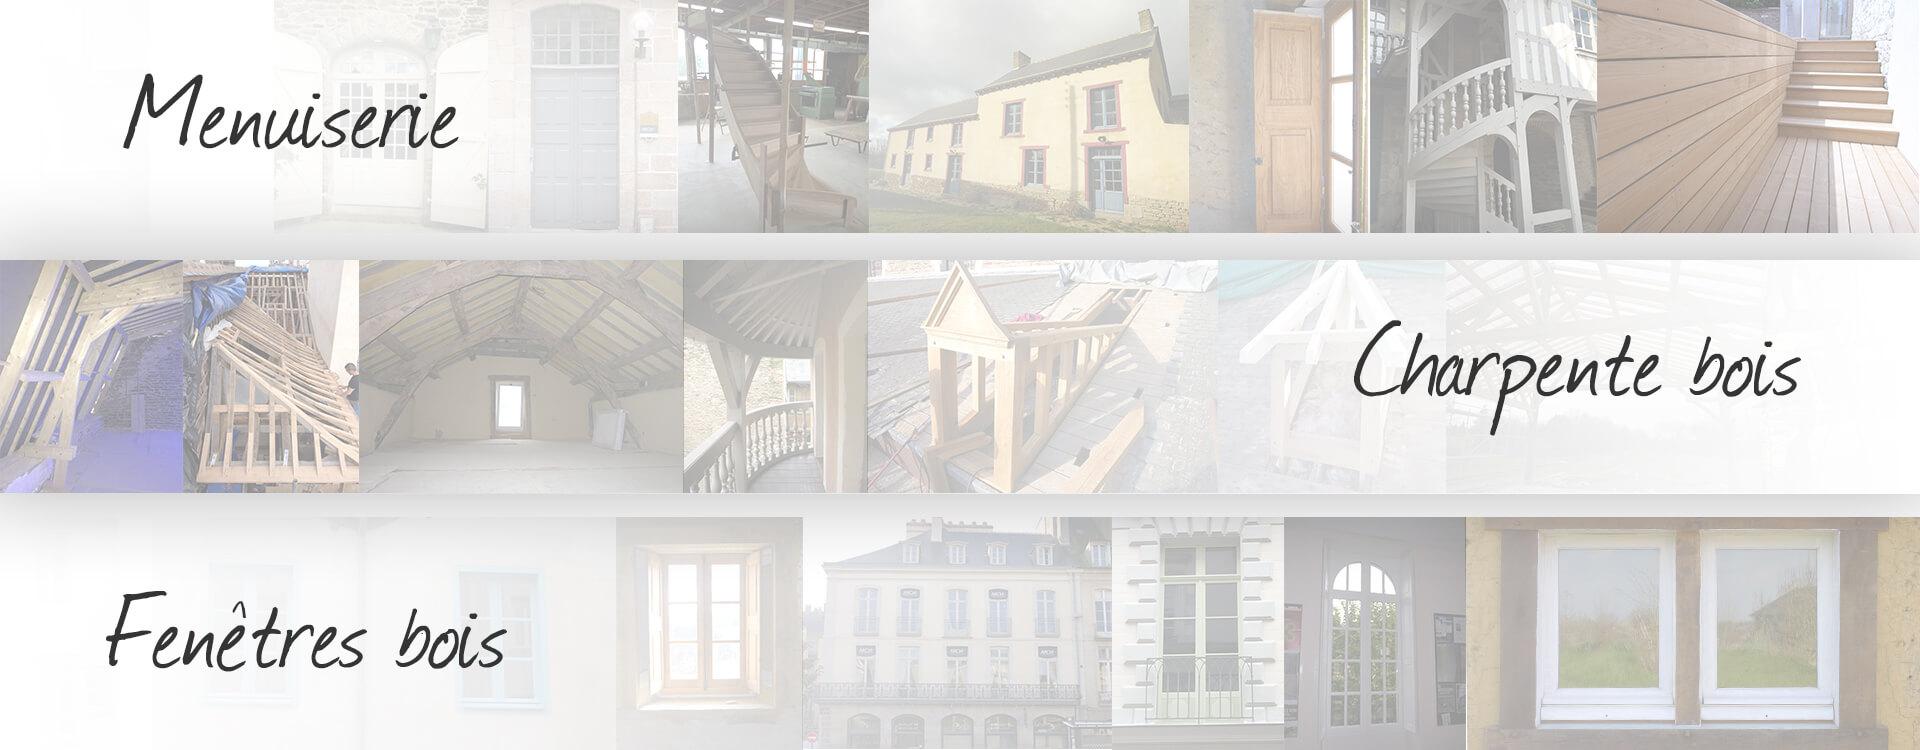 Restauration du patrimoine